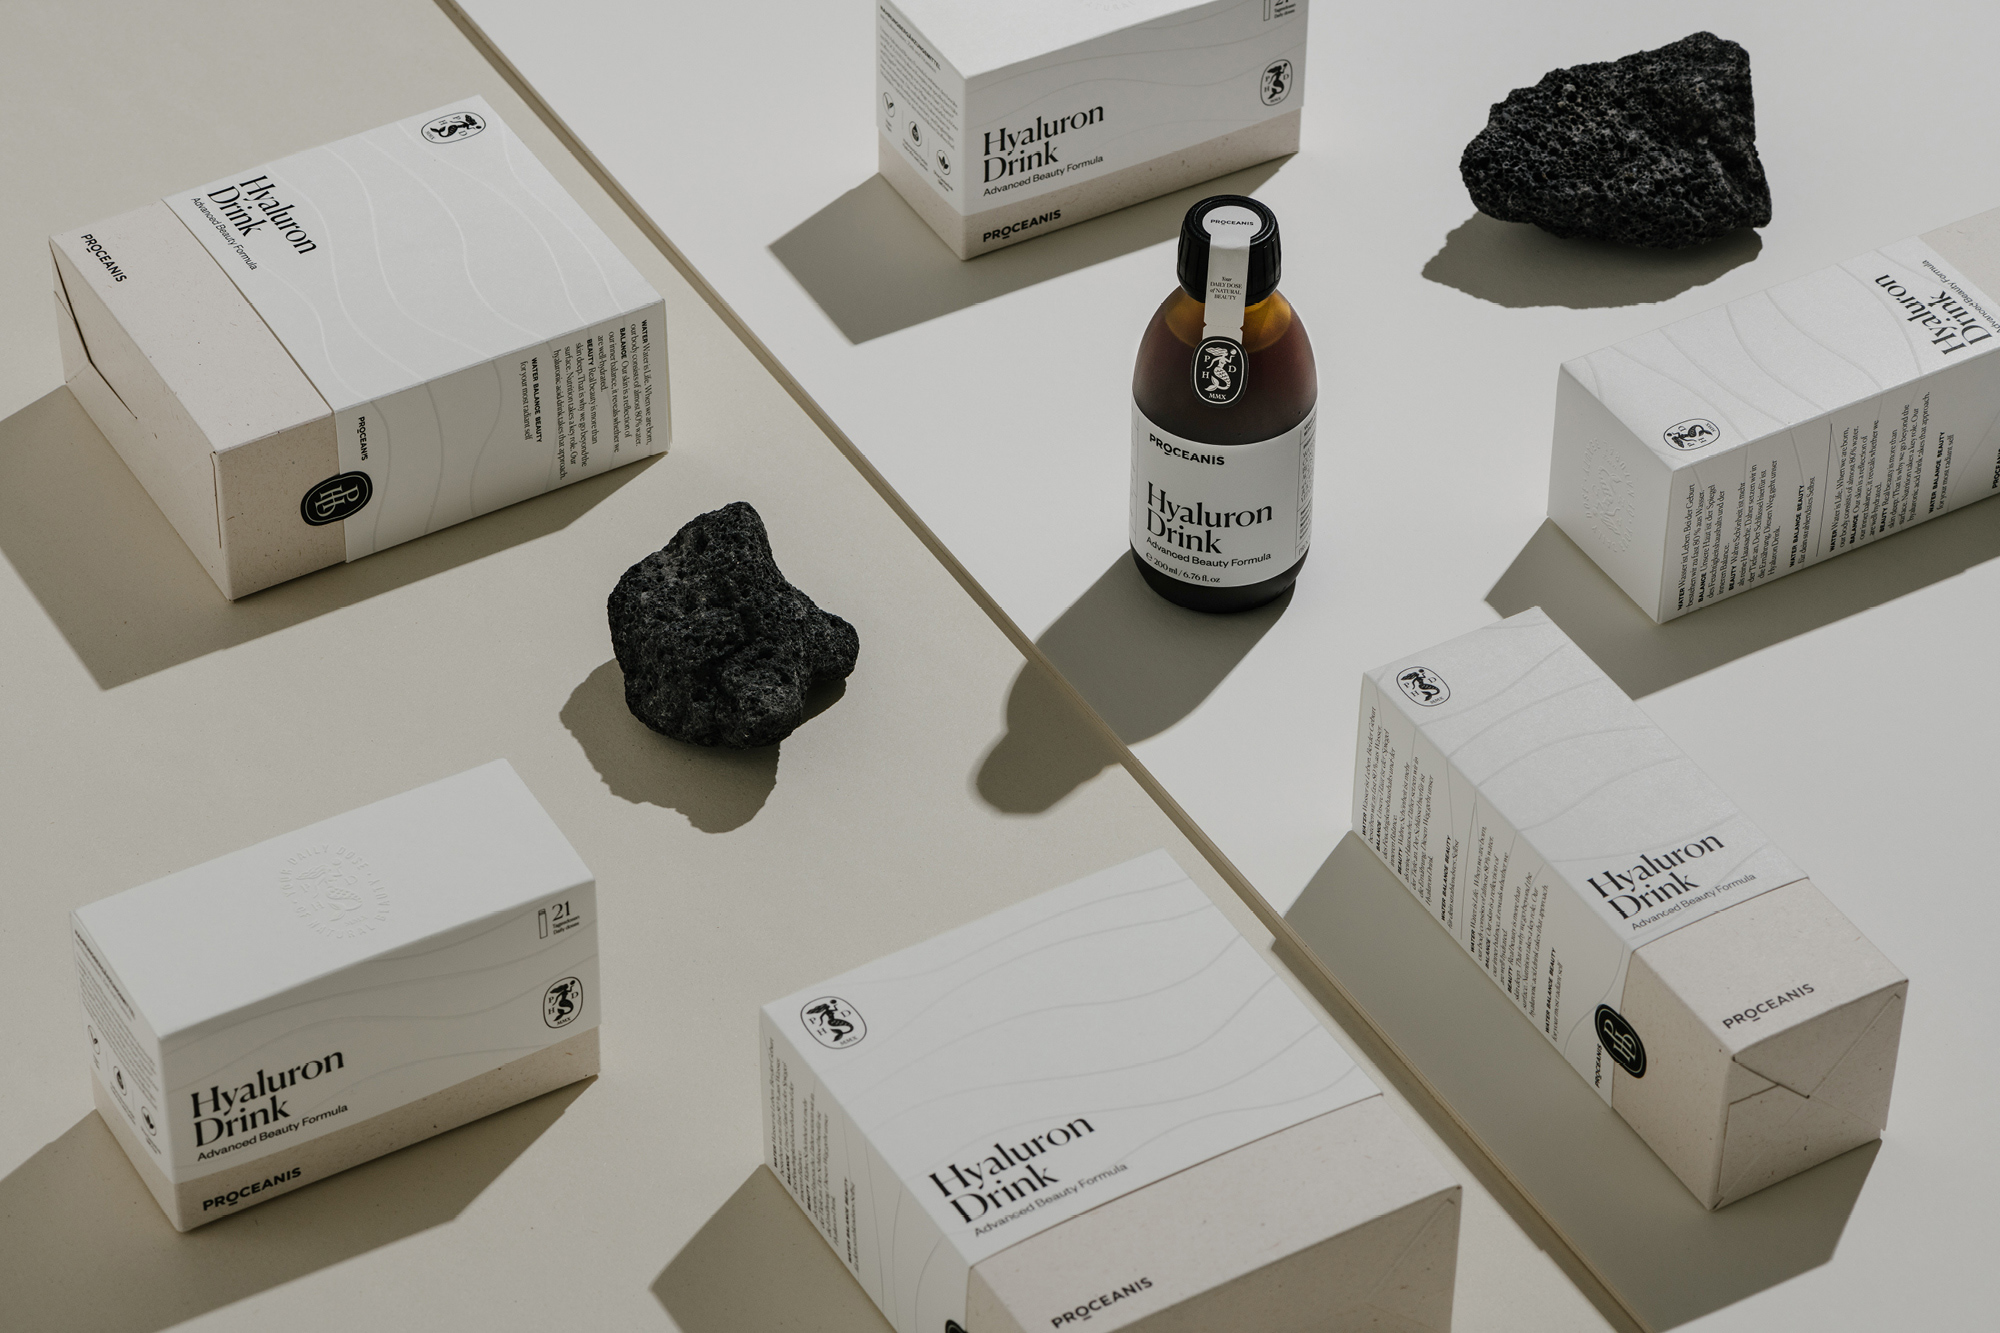 Marius Fahrner Design Rebranding for Proceanis Hyaluron Drink